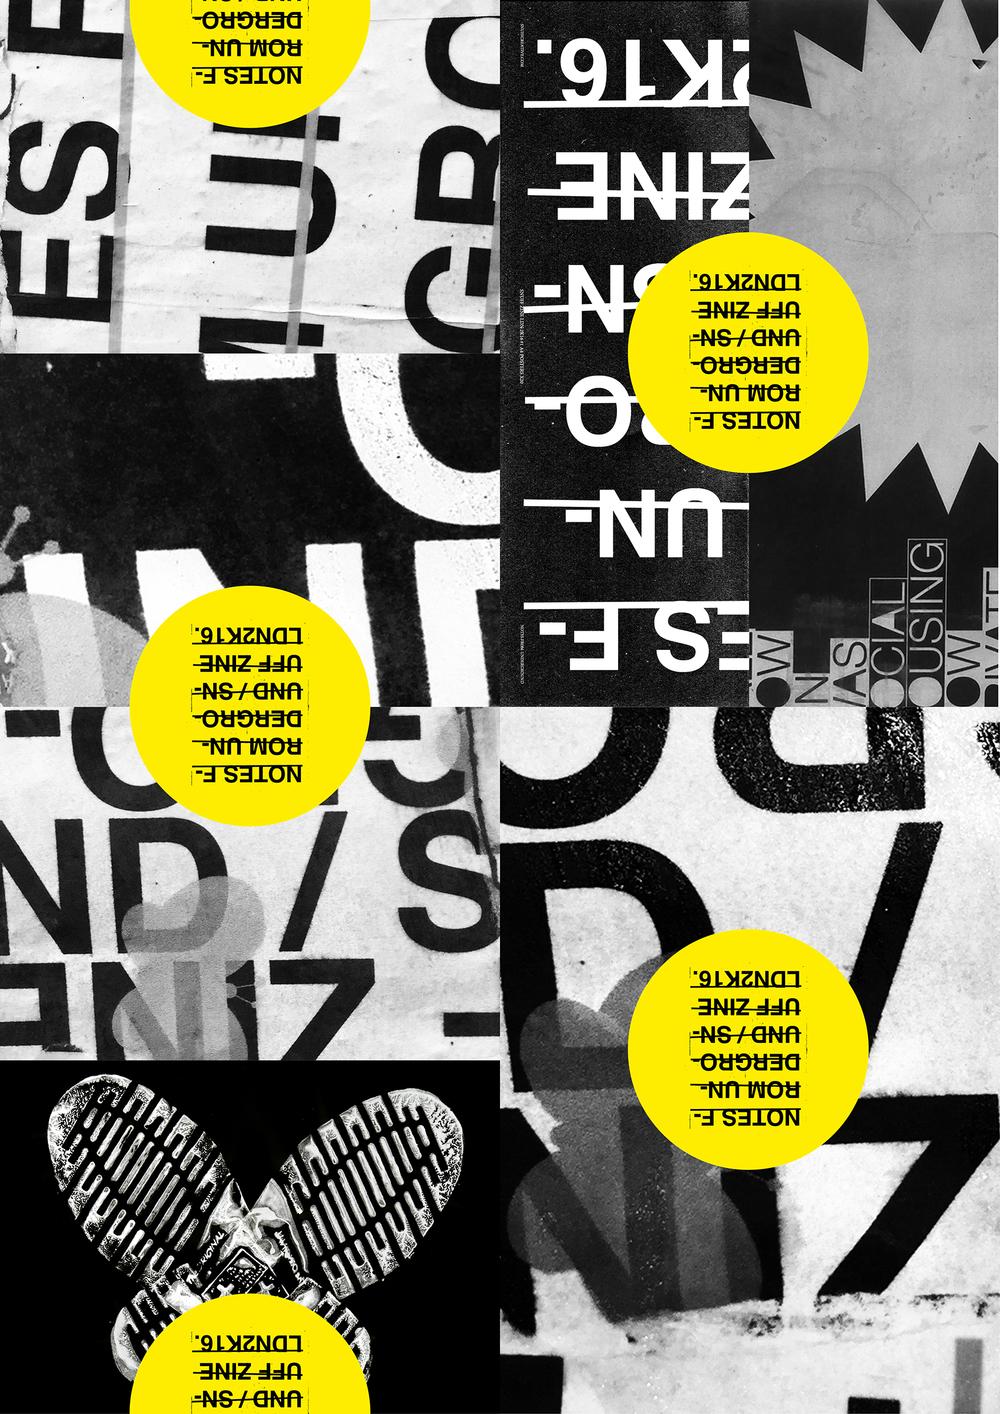 SNUFF ZINE \ TYPE COVER 3 #PUNKLONDON